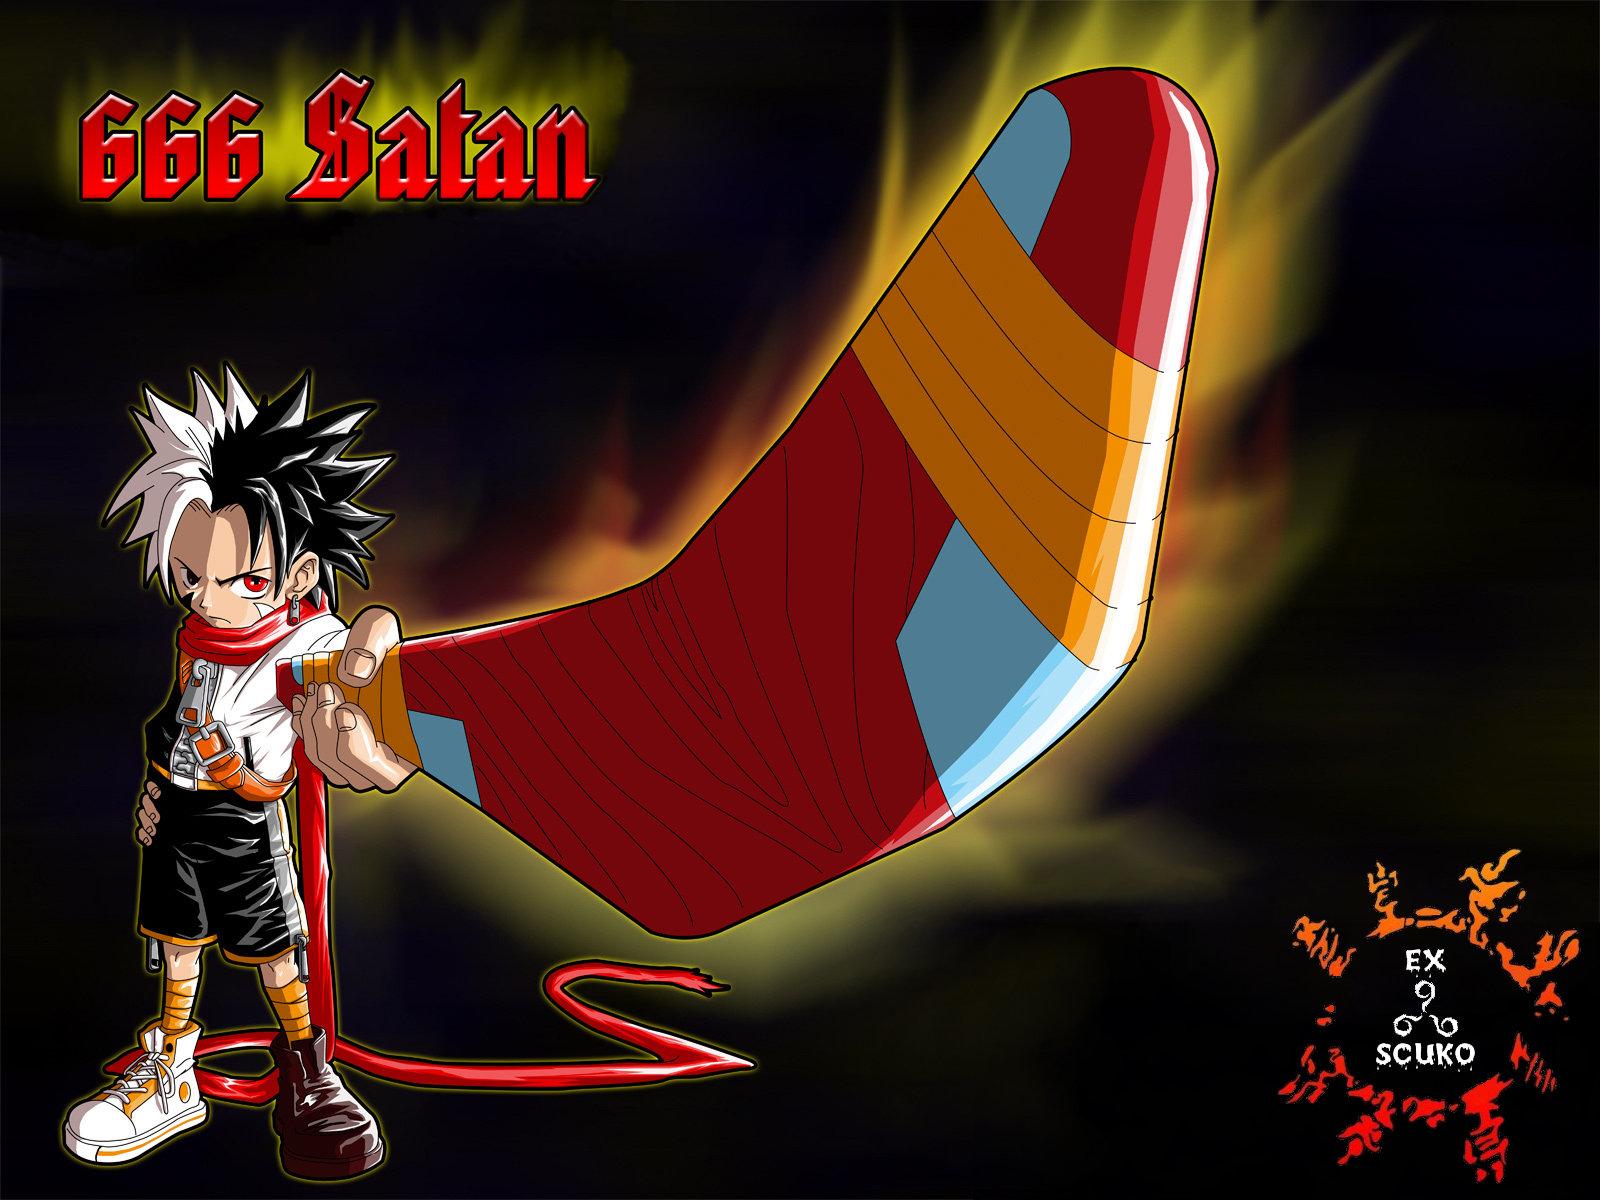 Манга Онлайн - 666 Satan / 666 Сатана 11 # 43 Теория мироздания - Страница №1 - 666 Satan